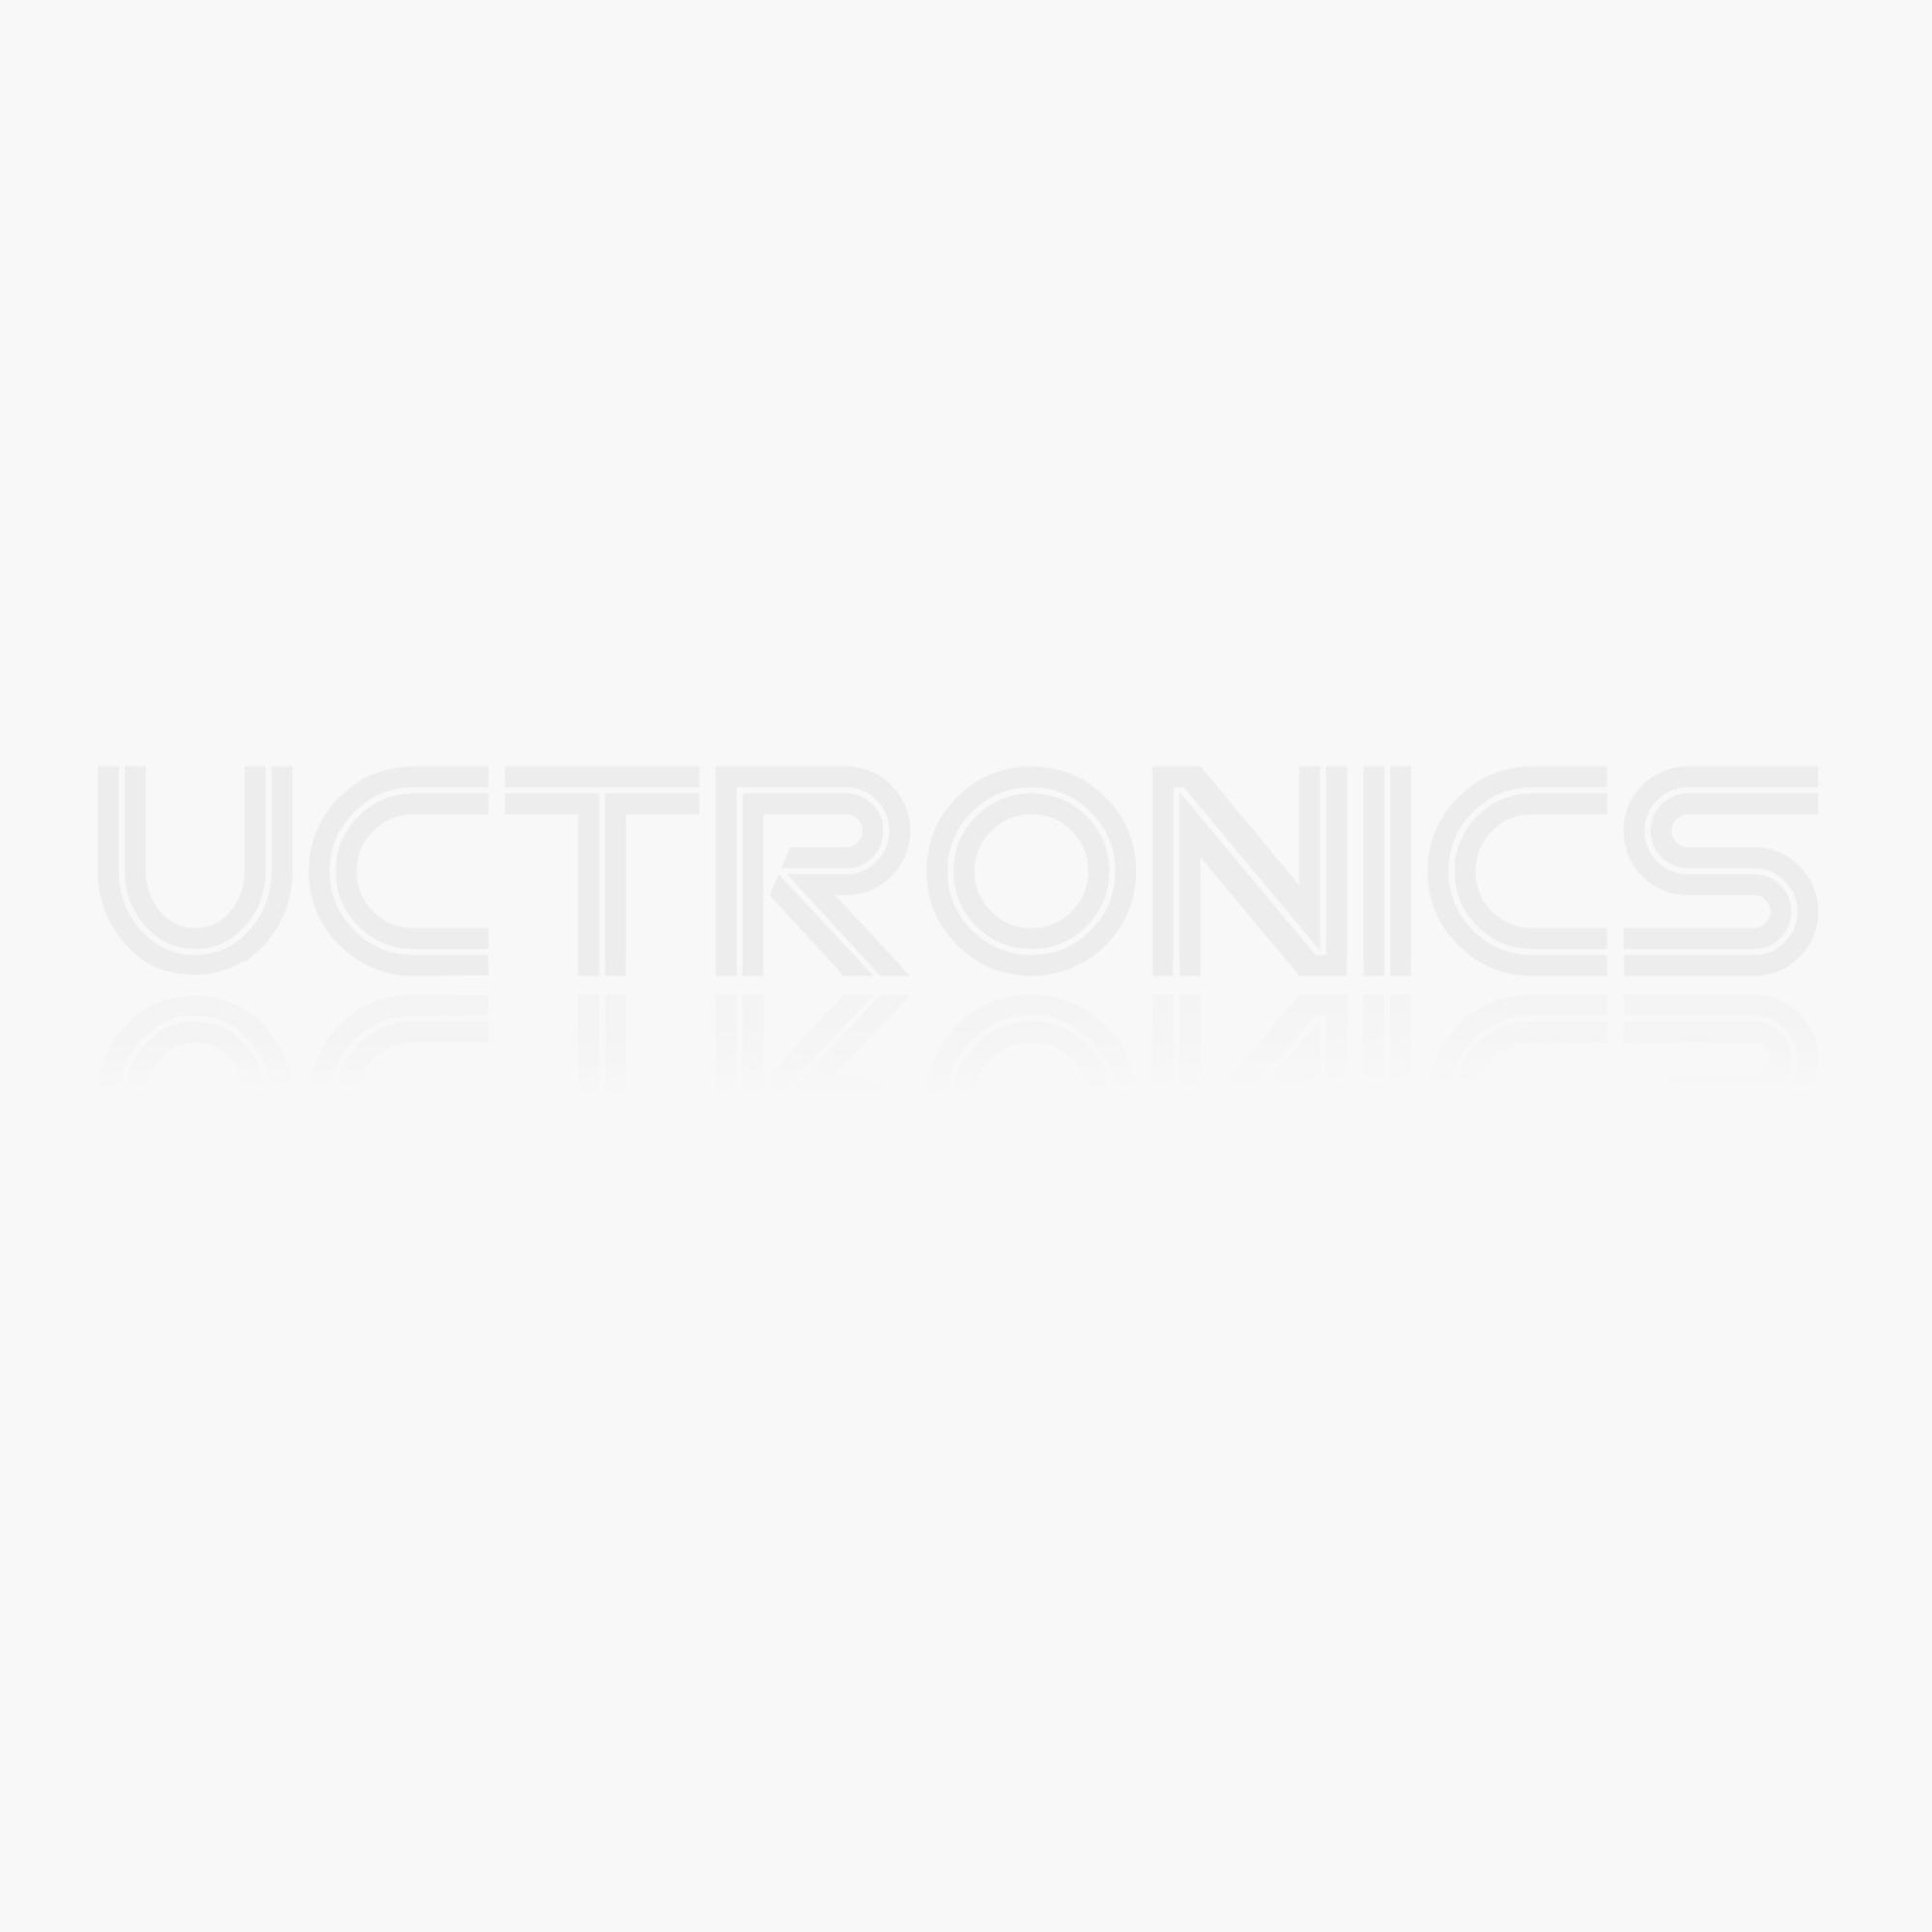 DC 1.8-12V TDA2822M 1W*2 2.0 Channel Stereo Audio Amplifier Board